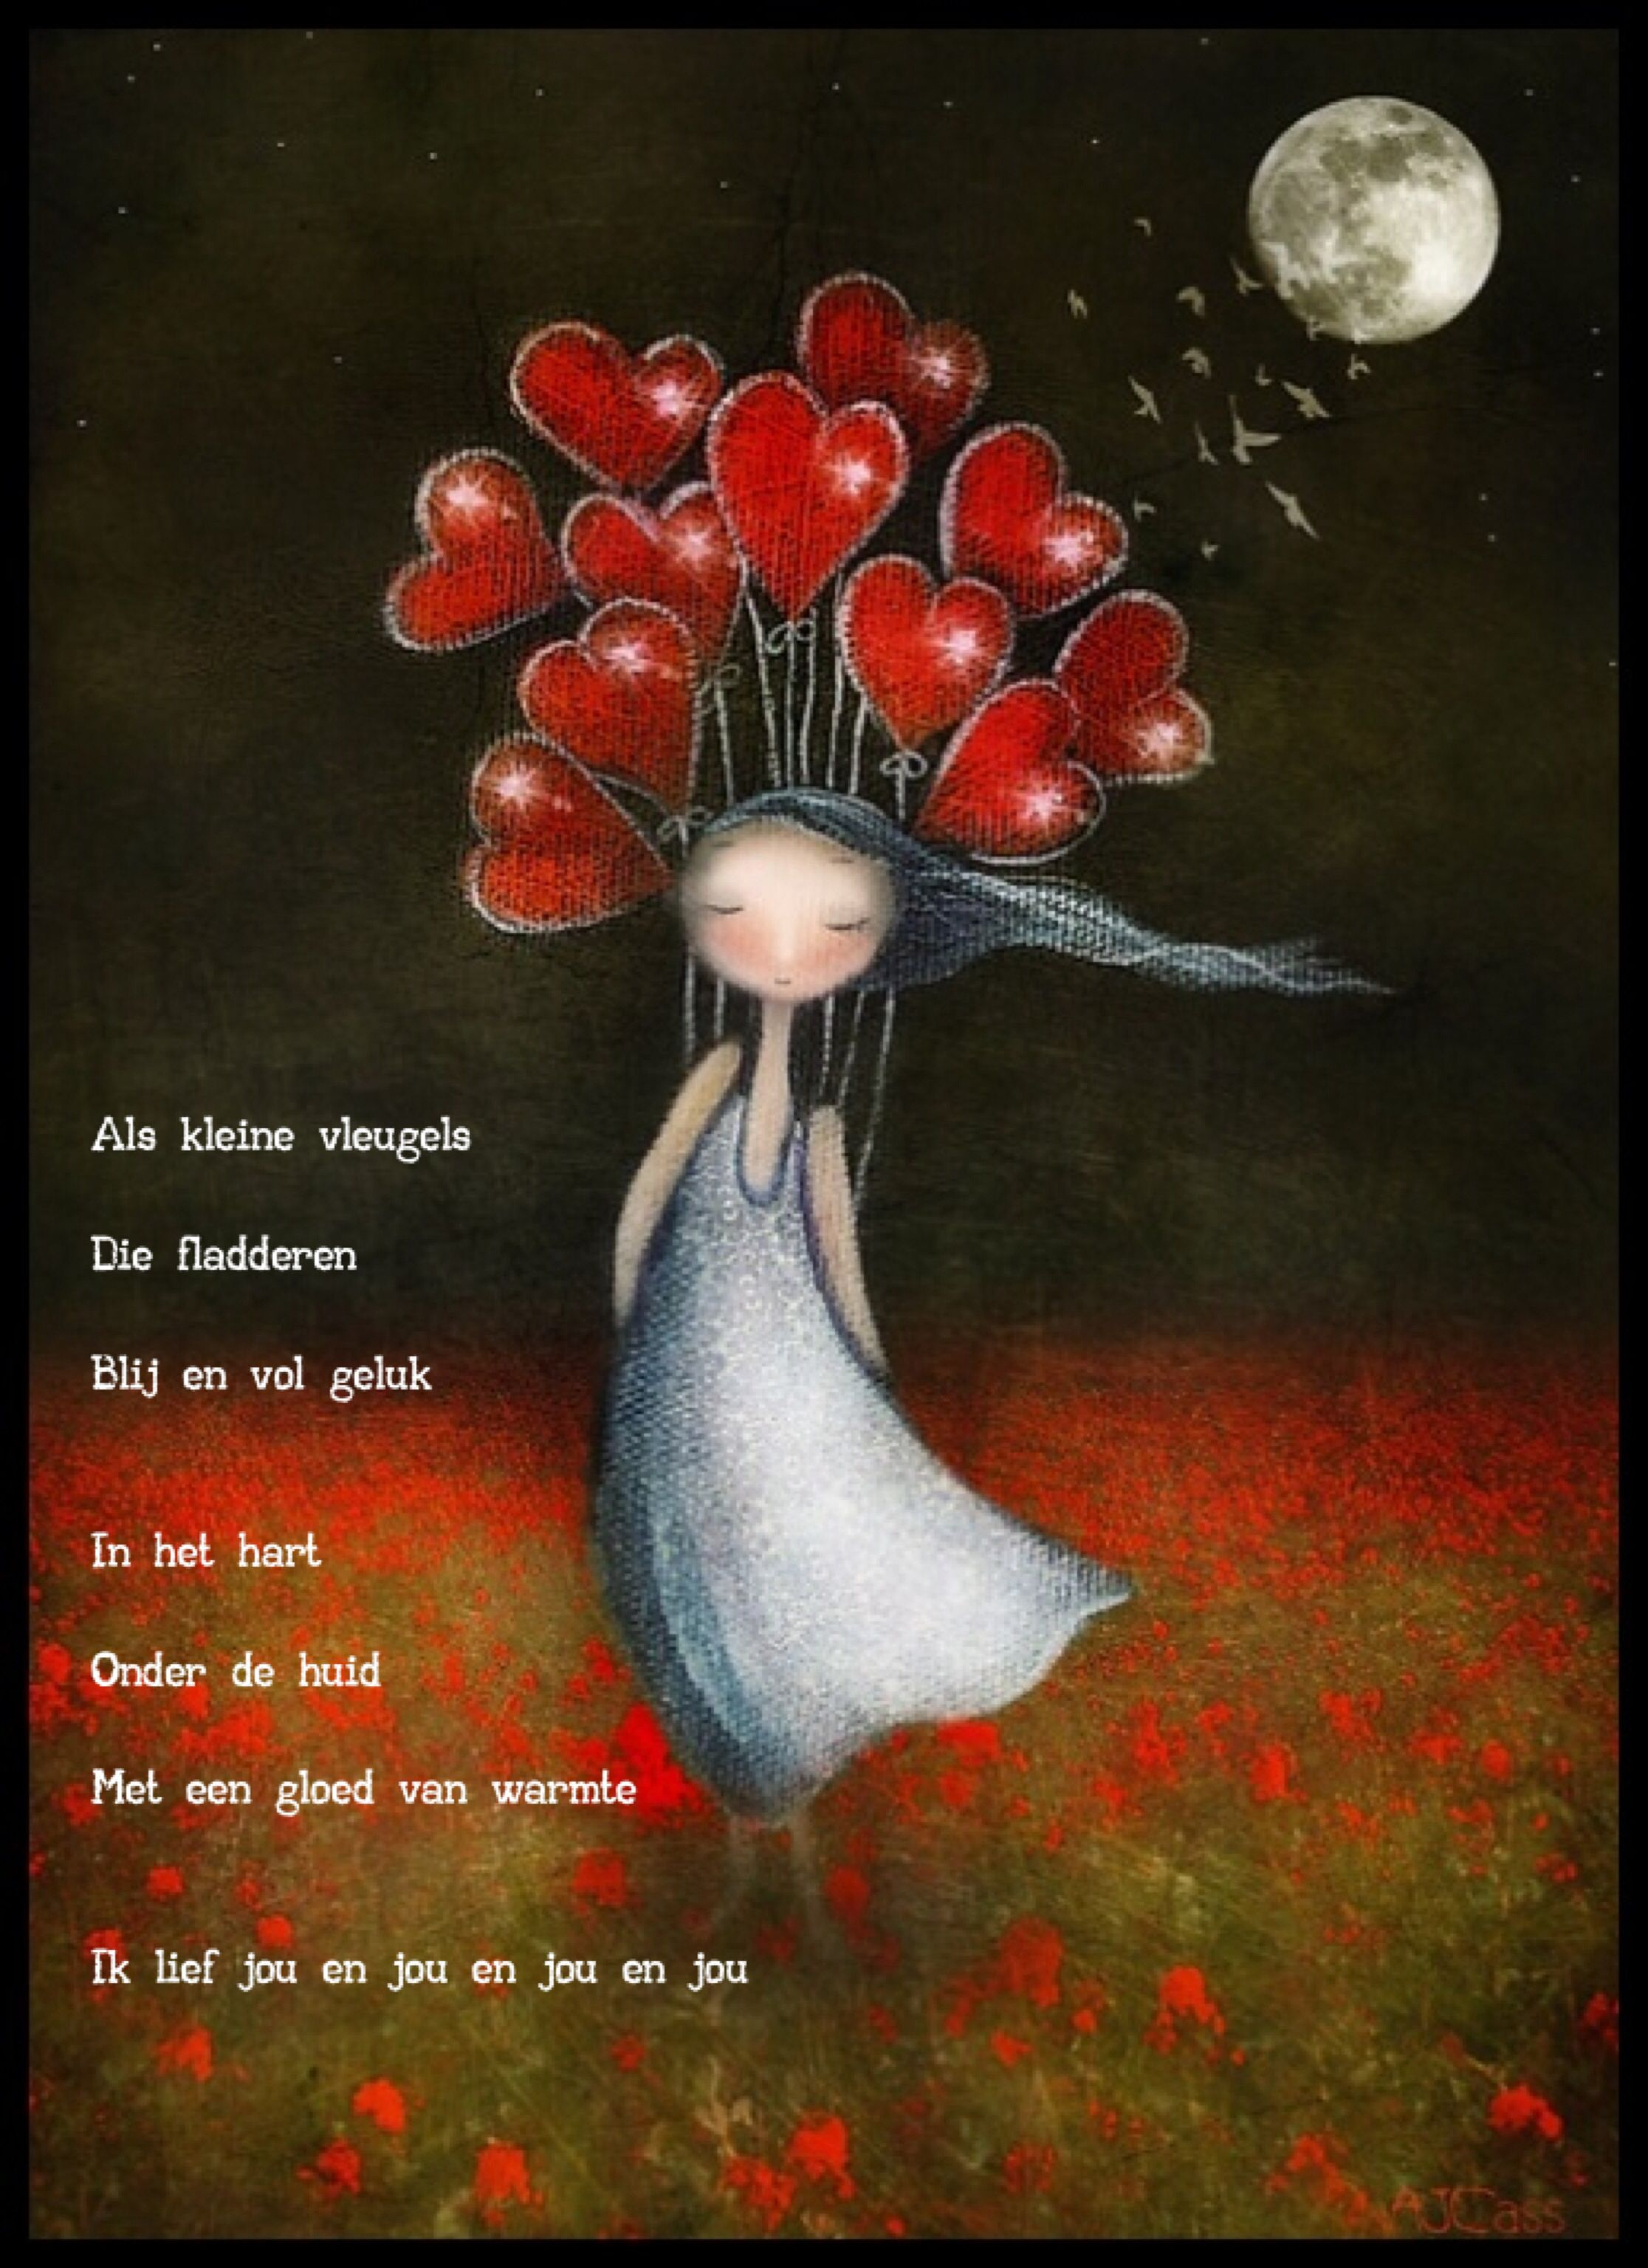 Ik lief jou spreuken gedichten om over na te for Hafiz gedichten